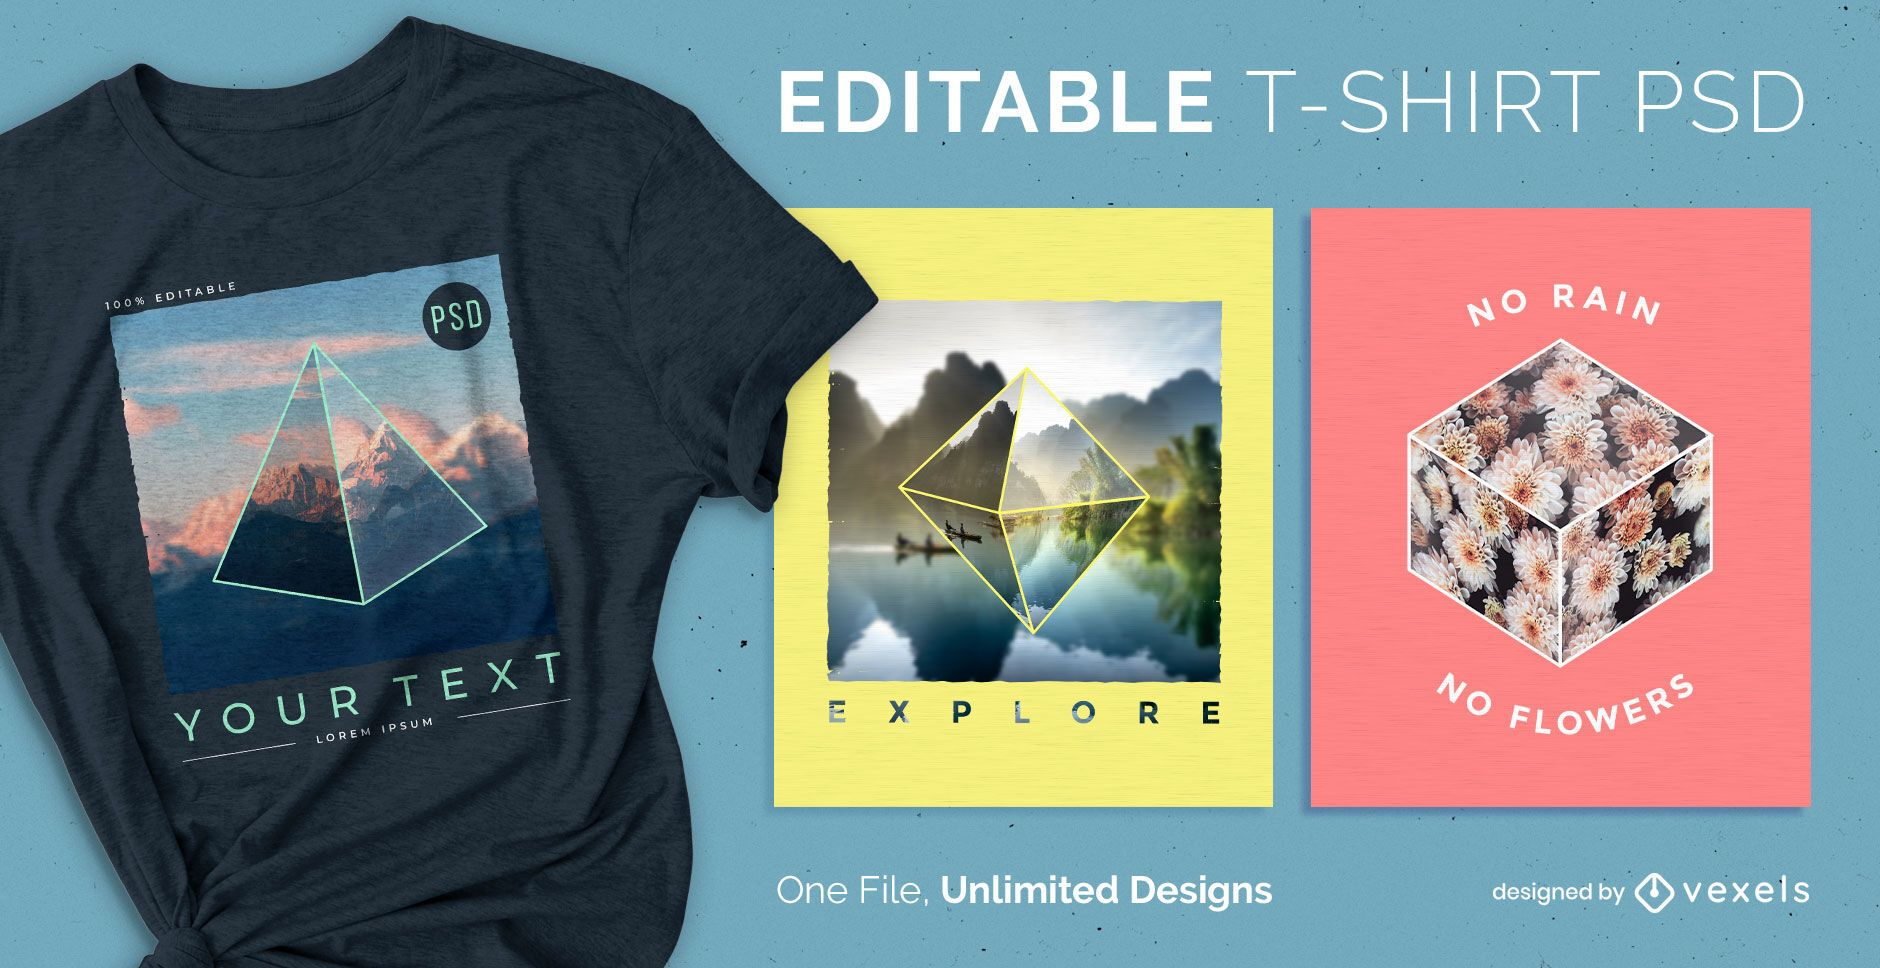 3d shapes scalable t-shirt psd